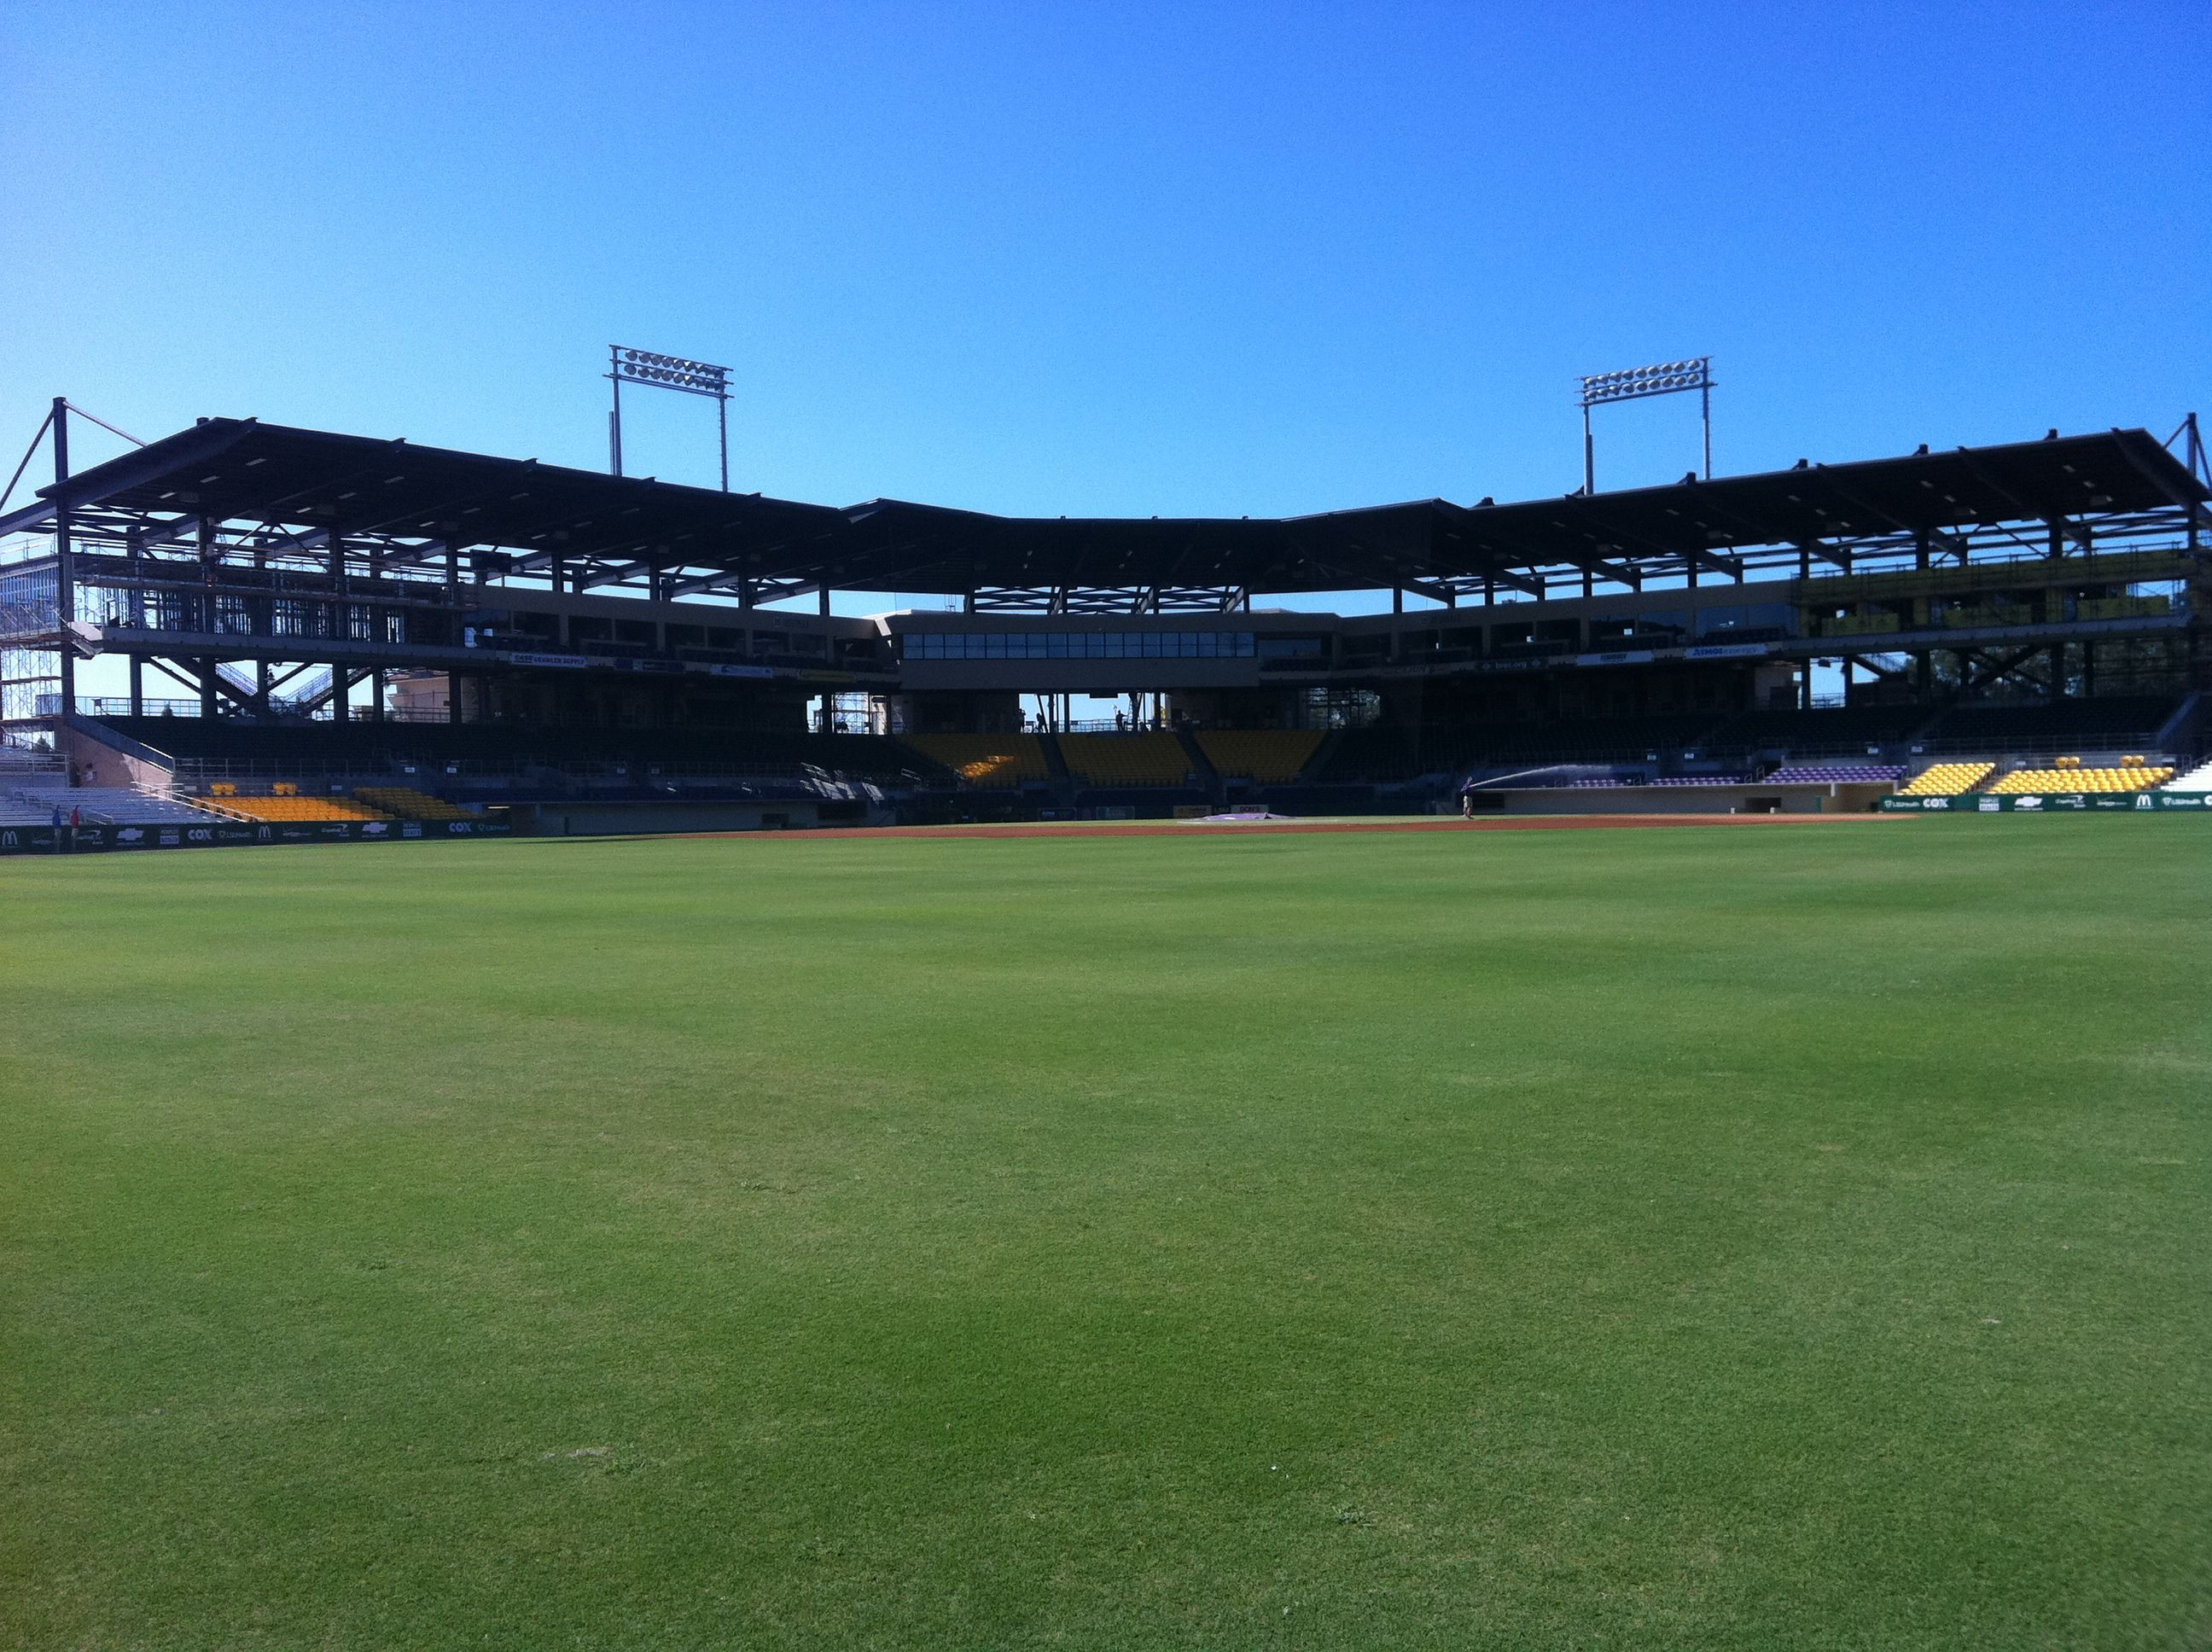 Alex Box Stadium Home Of The Lsu Tigers Baseball Team Baseball Park Lsu Tigers Baseball Baseball Stadium